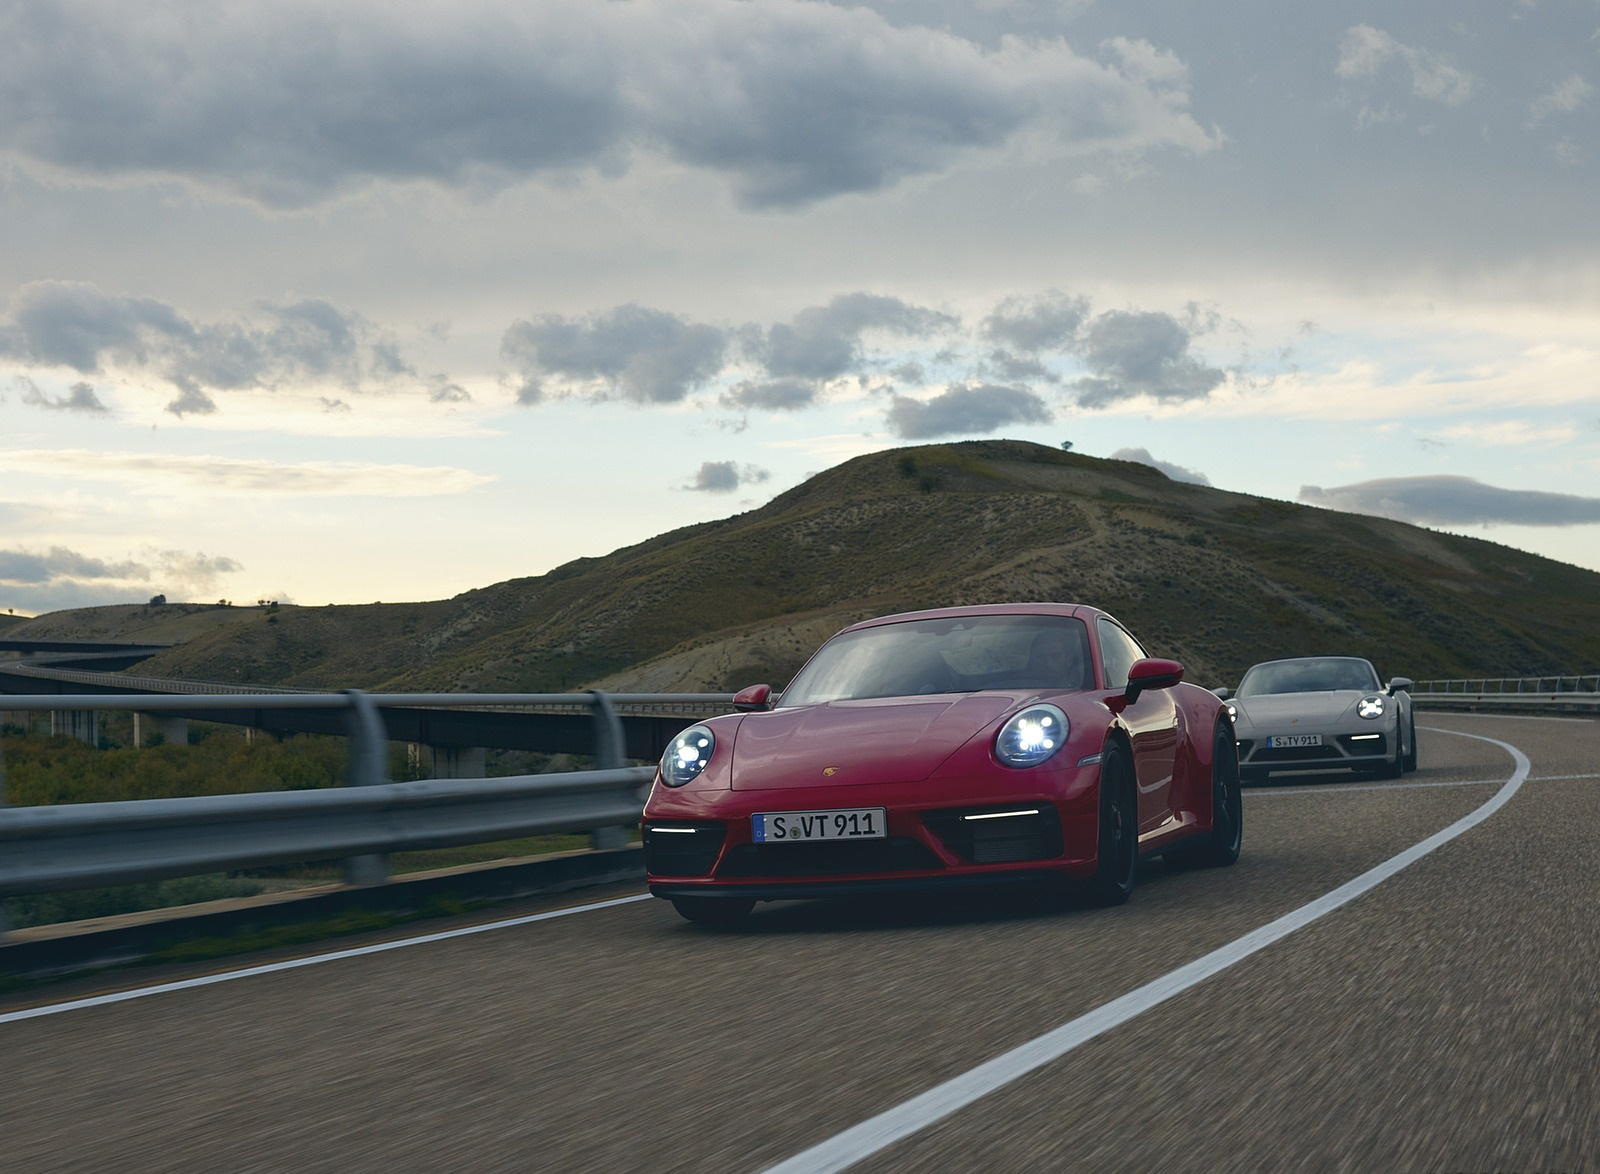 2022 Porsche 911 Carrera GTS and 911 Targa 4 GTS Front Wallpapers (8)